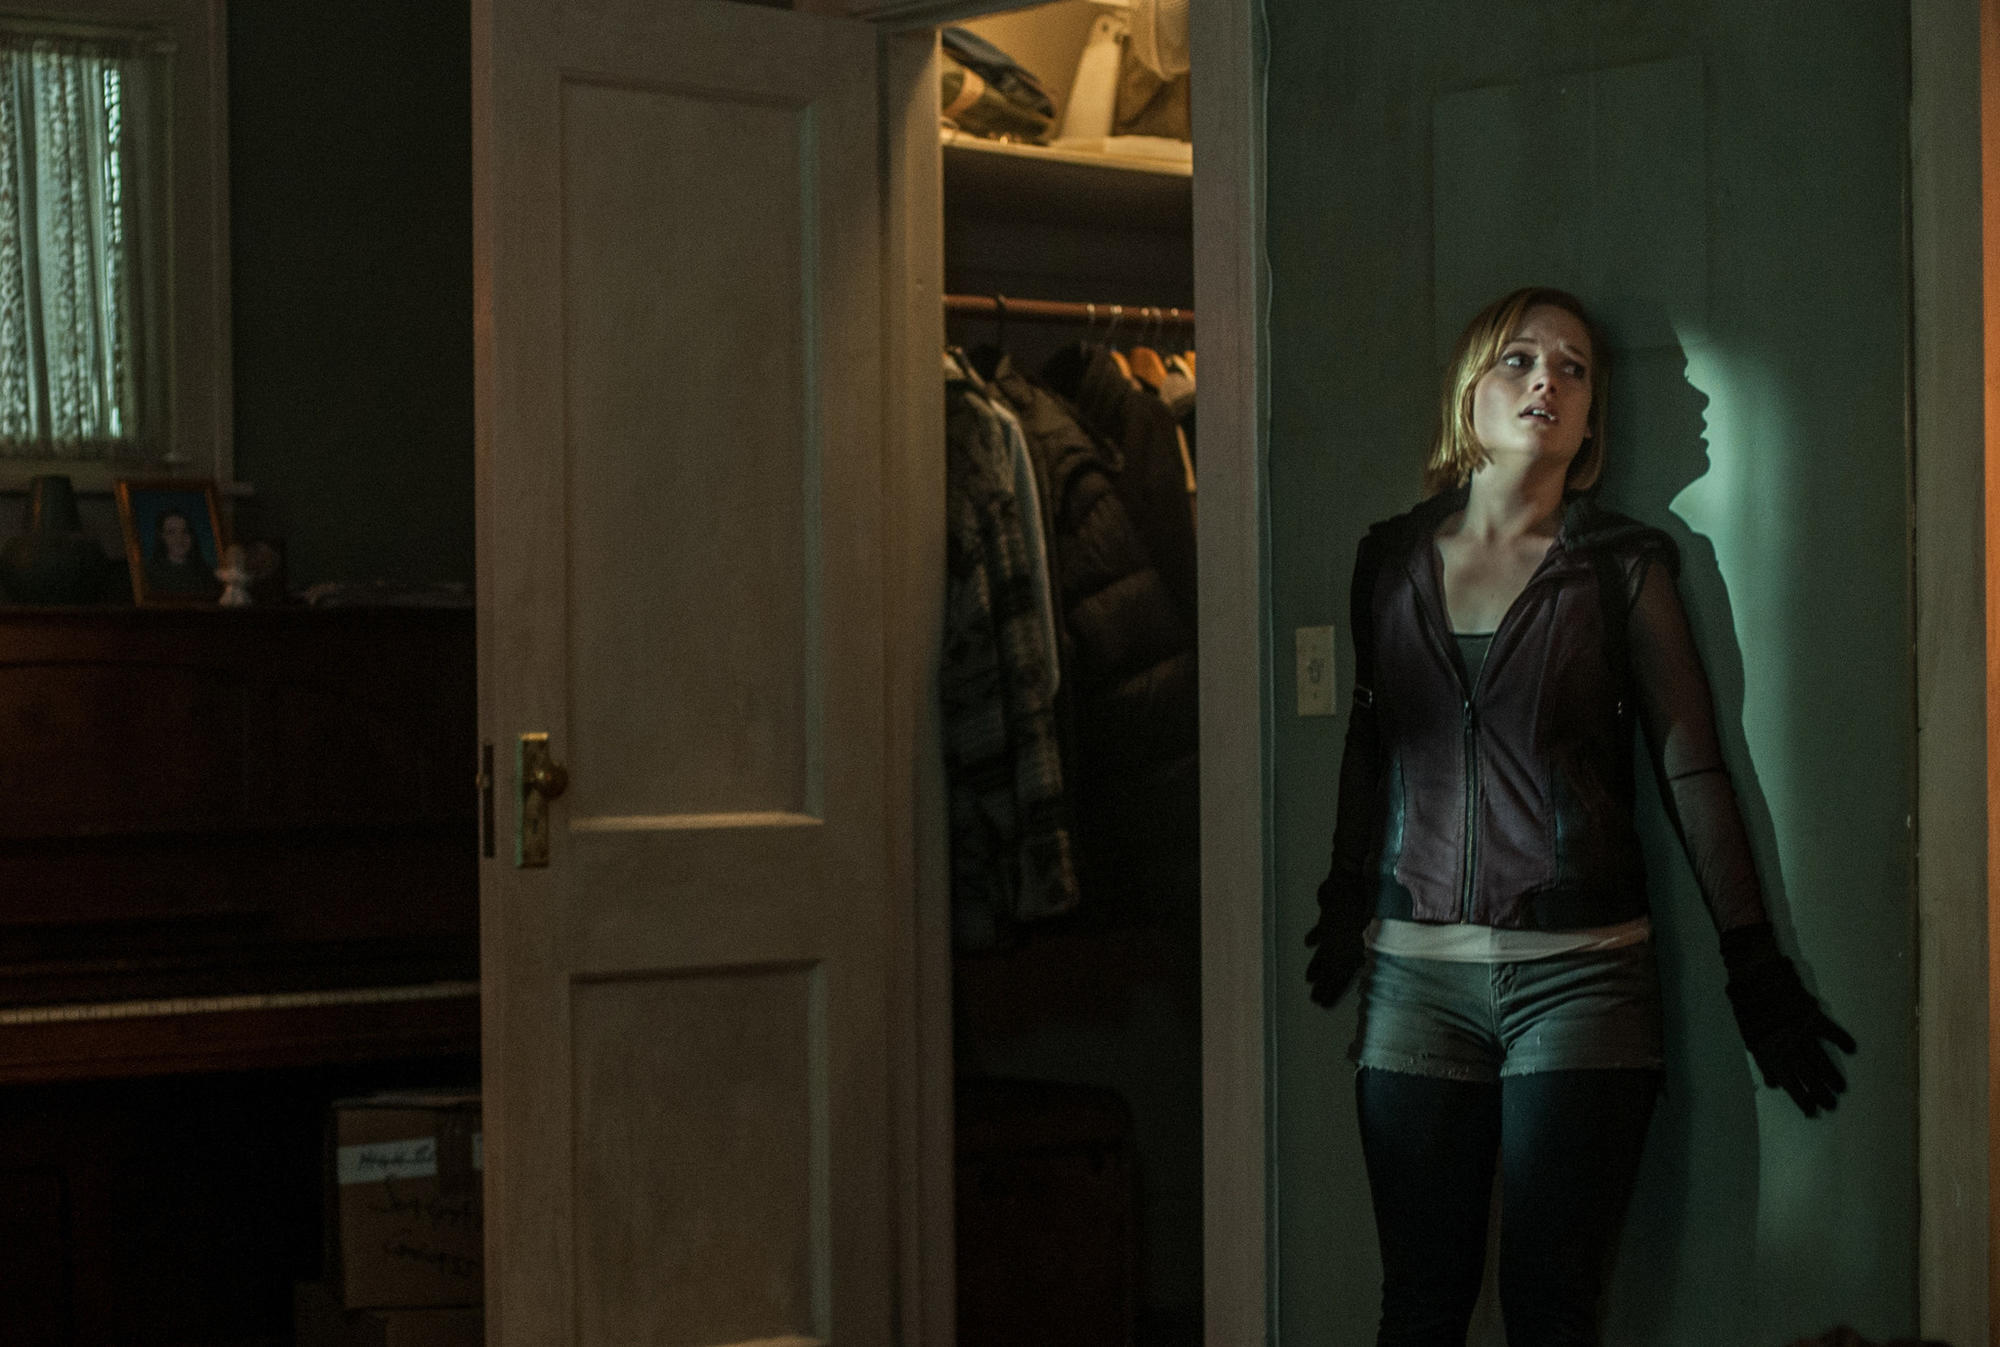 Jane Levy stars as Rocky in Screen Gems' horror-thriller